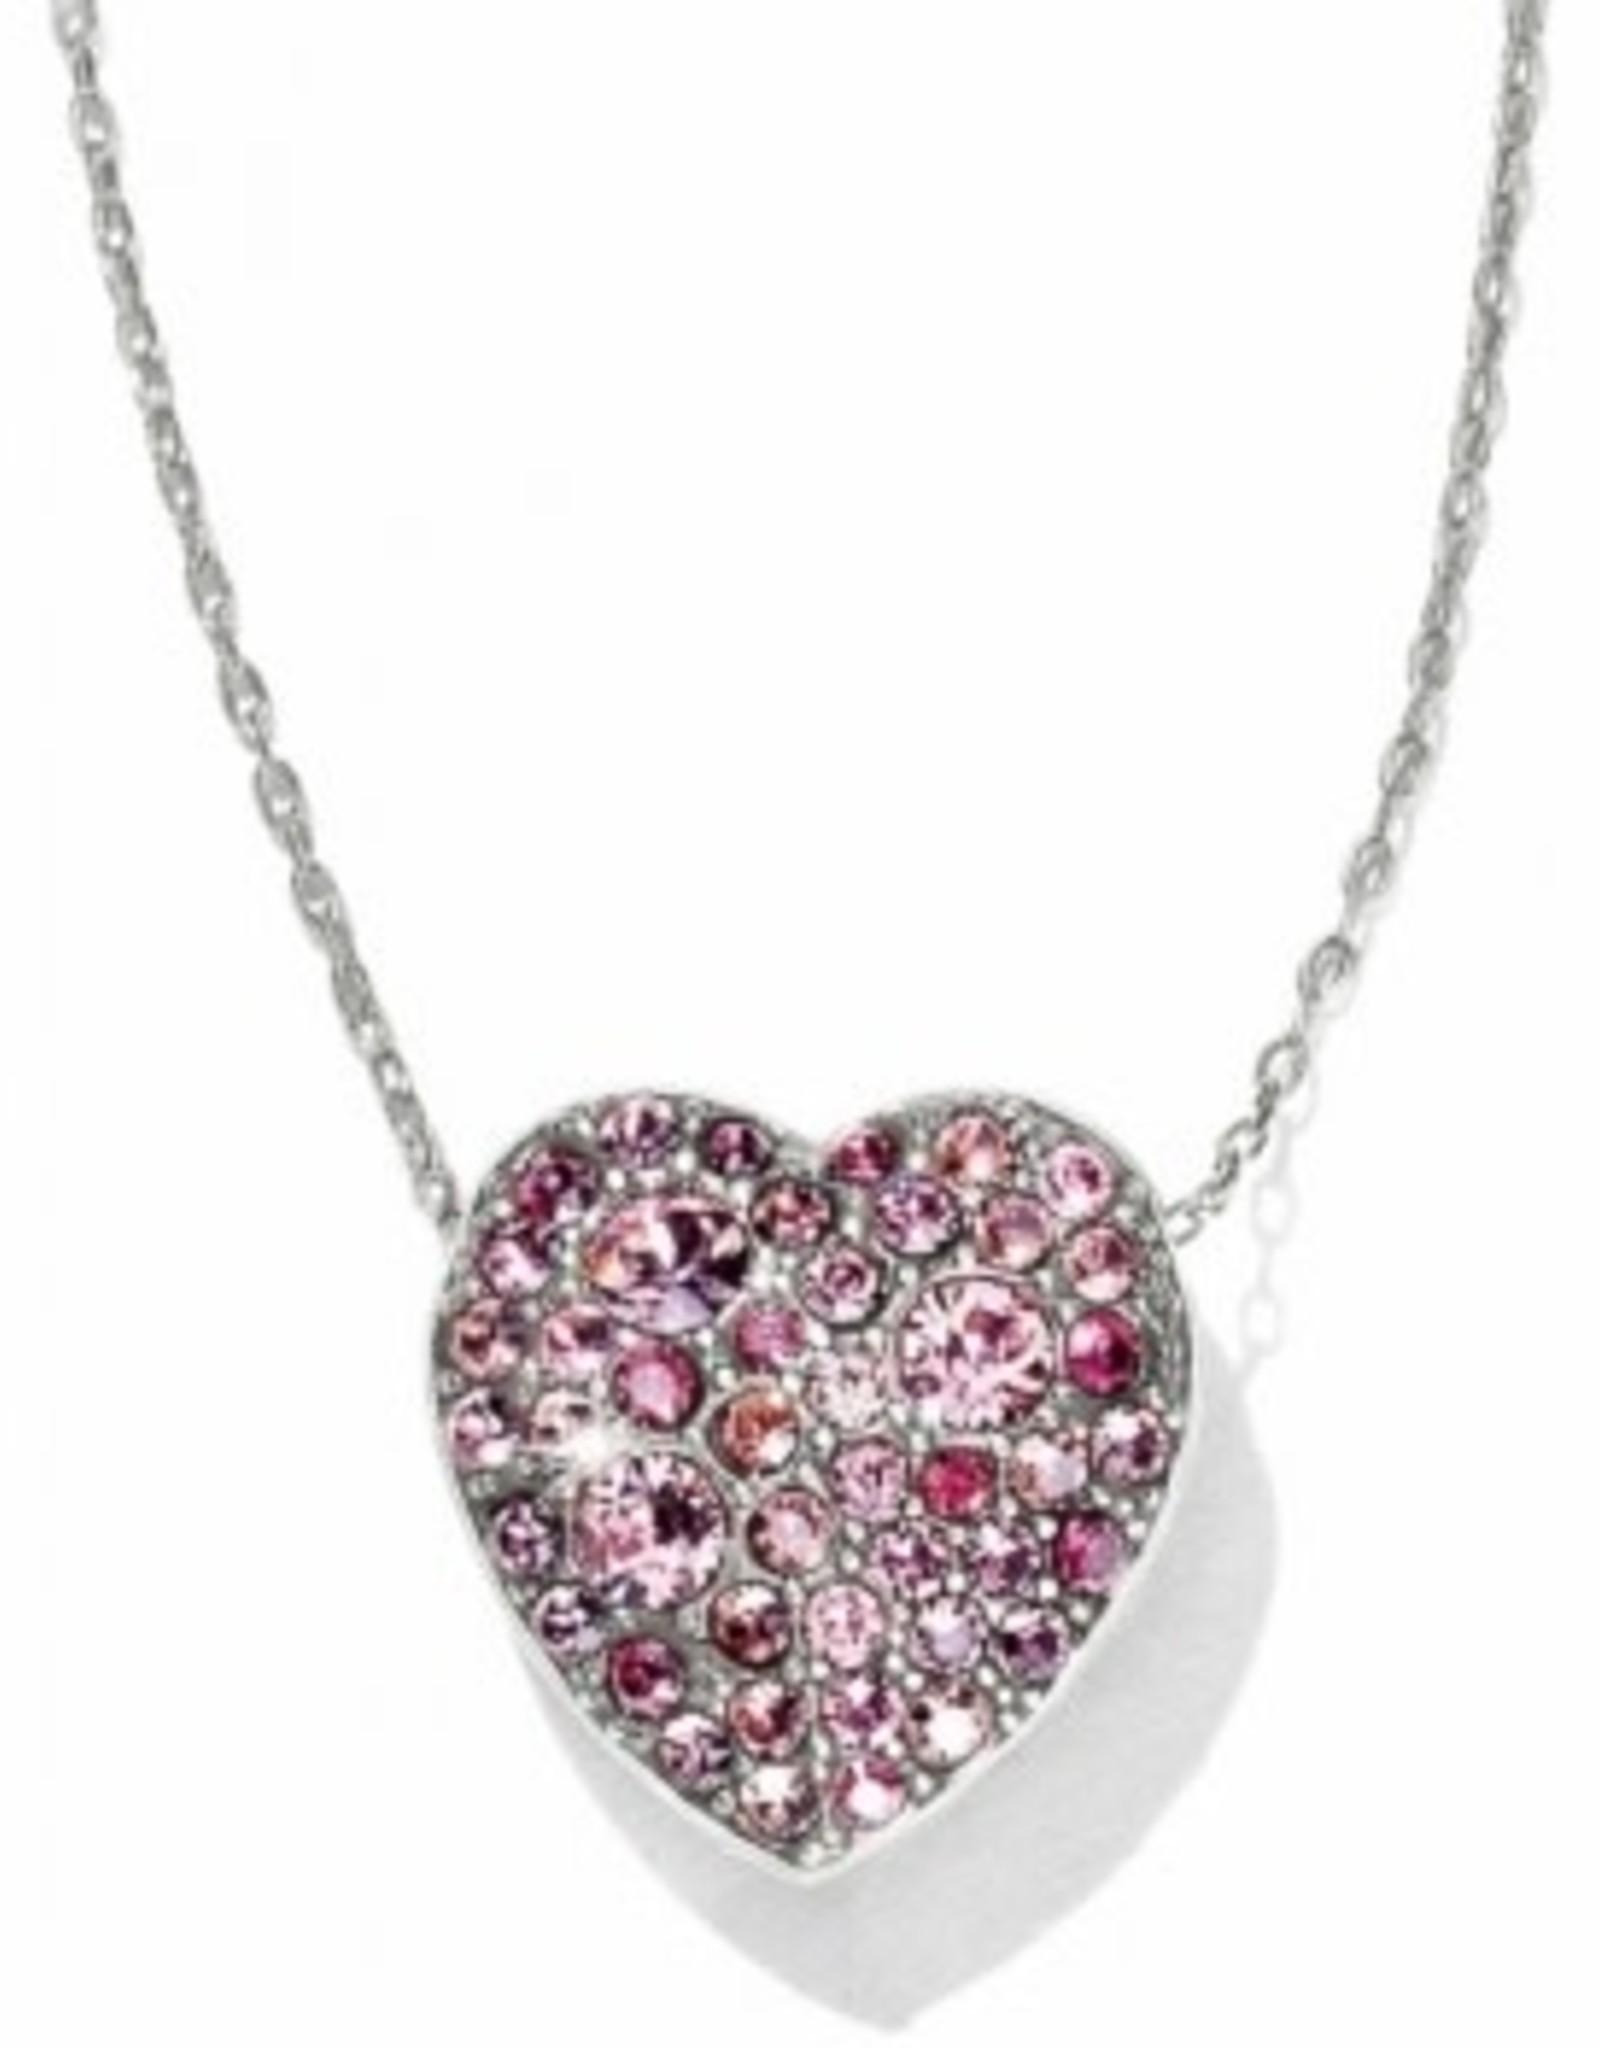 Brighton Brighton, Anatolia Heart Reversible Necklace, Pink